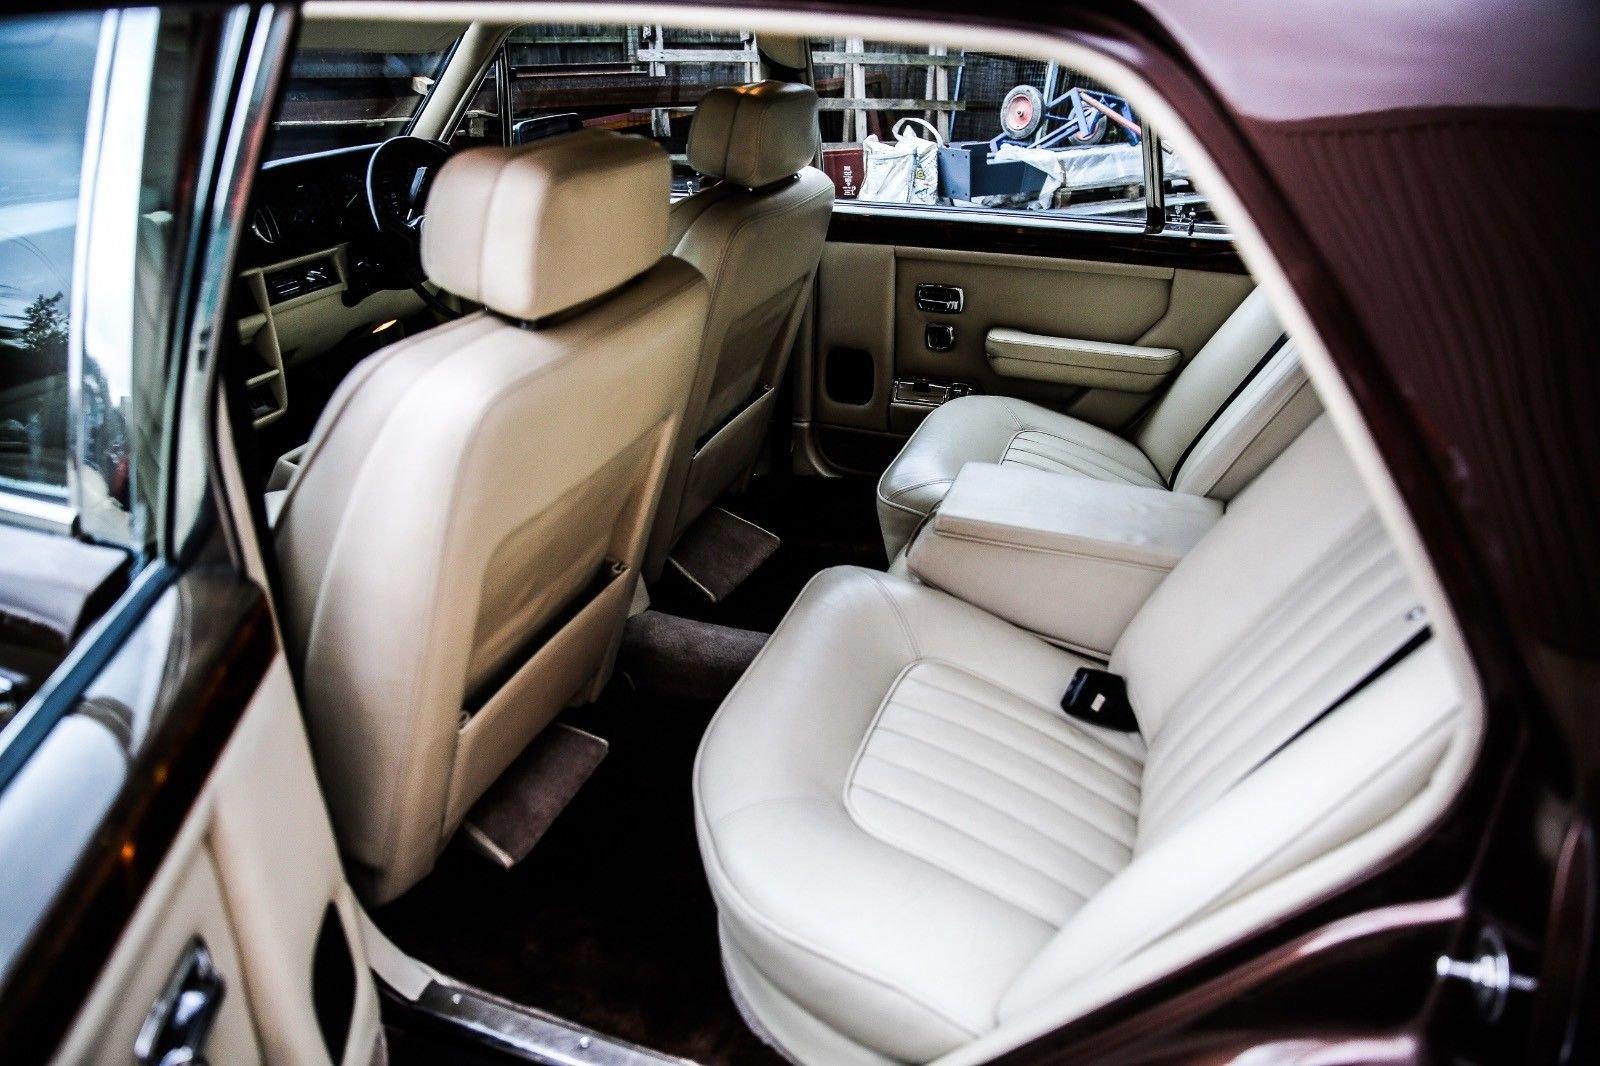 1986 Rolls Royce Silver Spirit